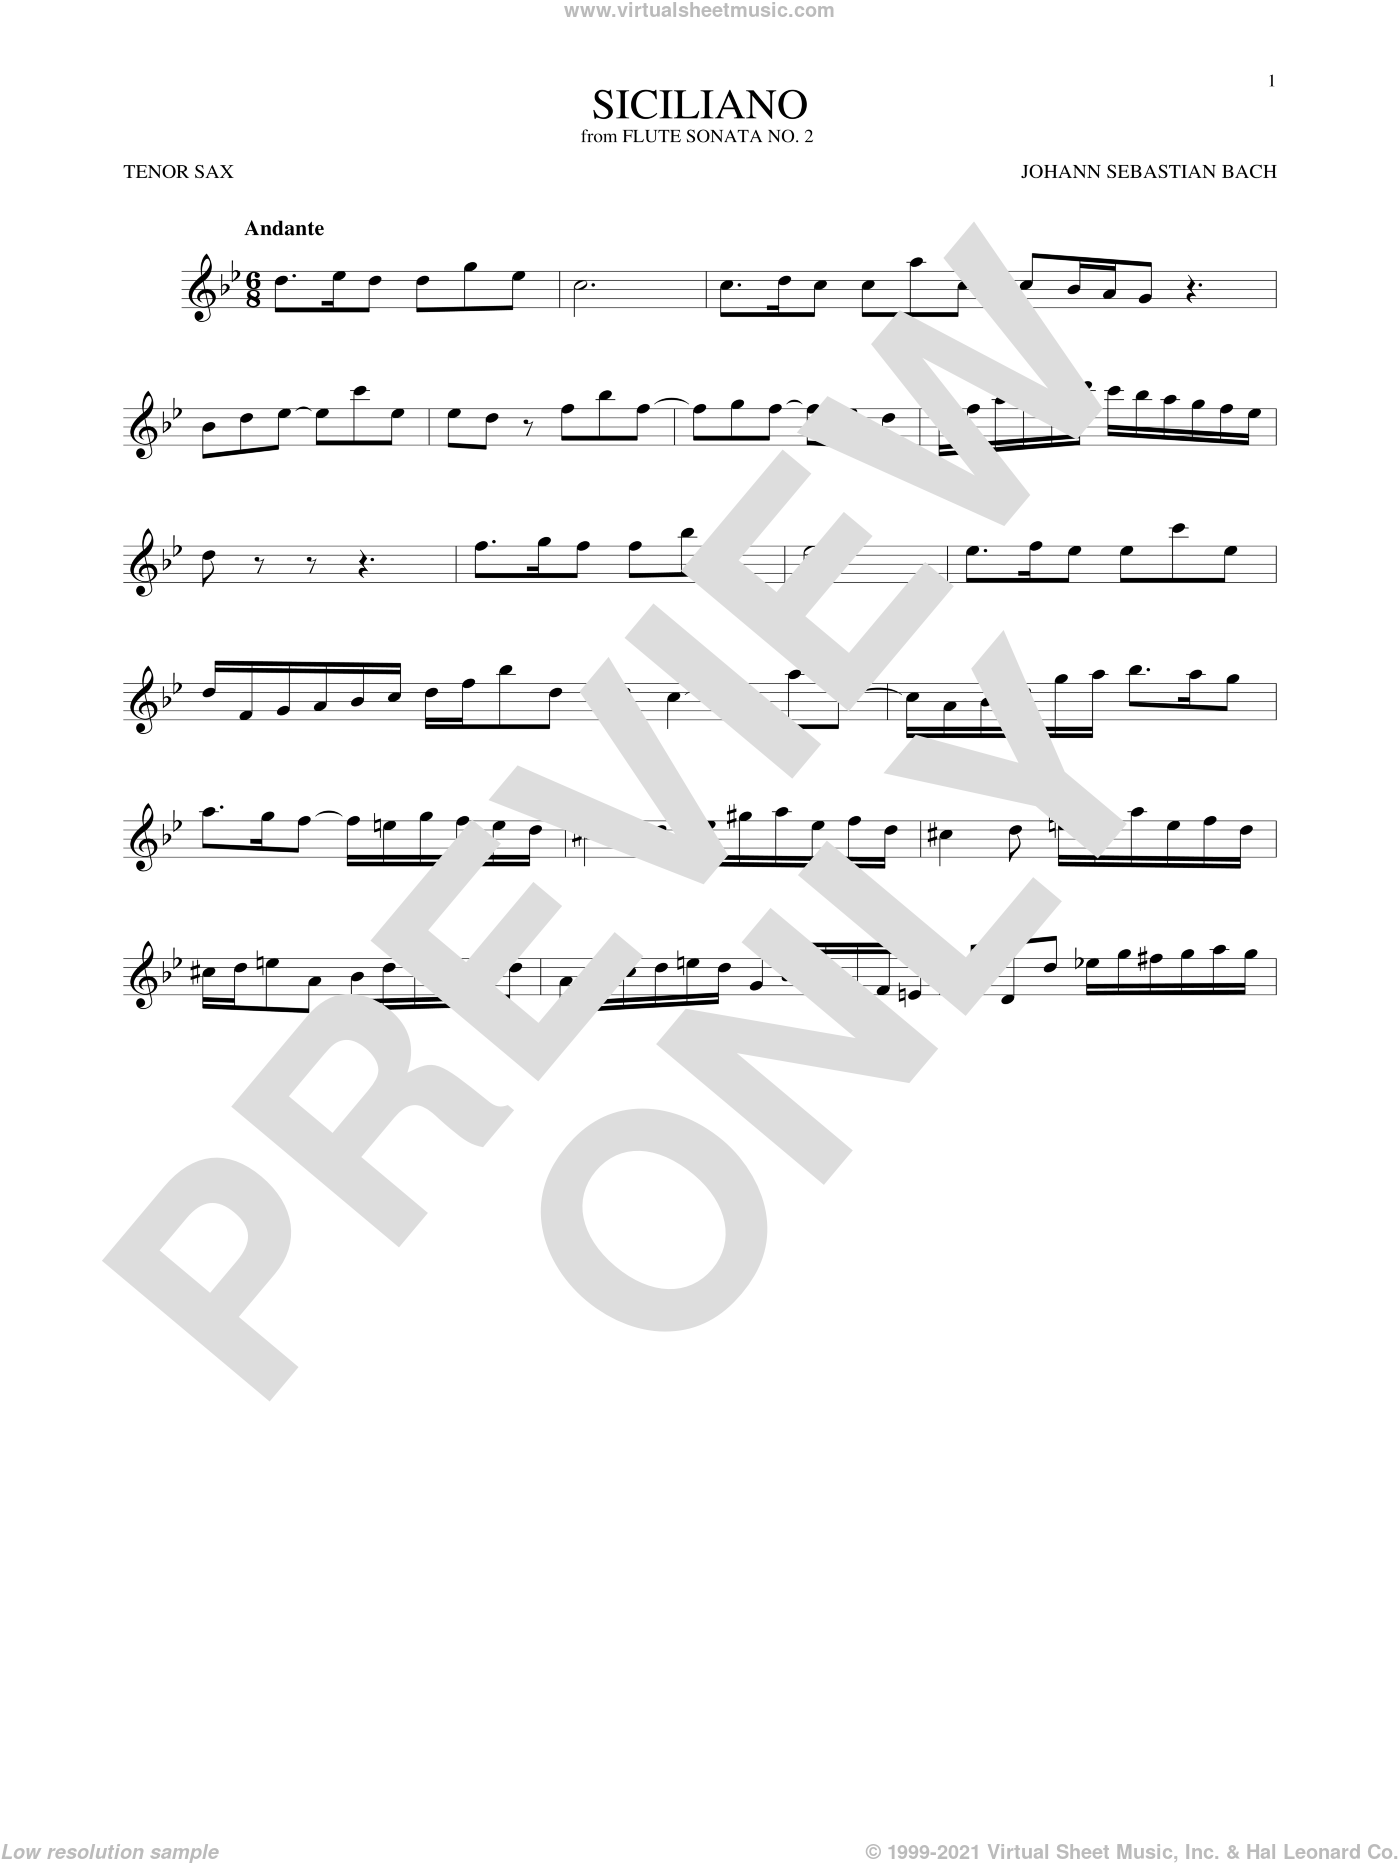 Siciliano sheet music for tenor saxophone solo by Johann Sebastian Bach, classical score, intermediate skill level